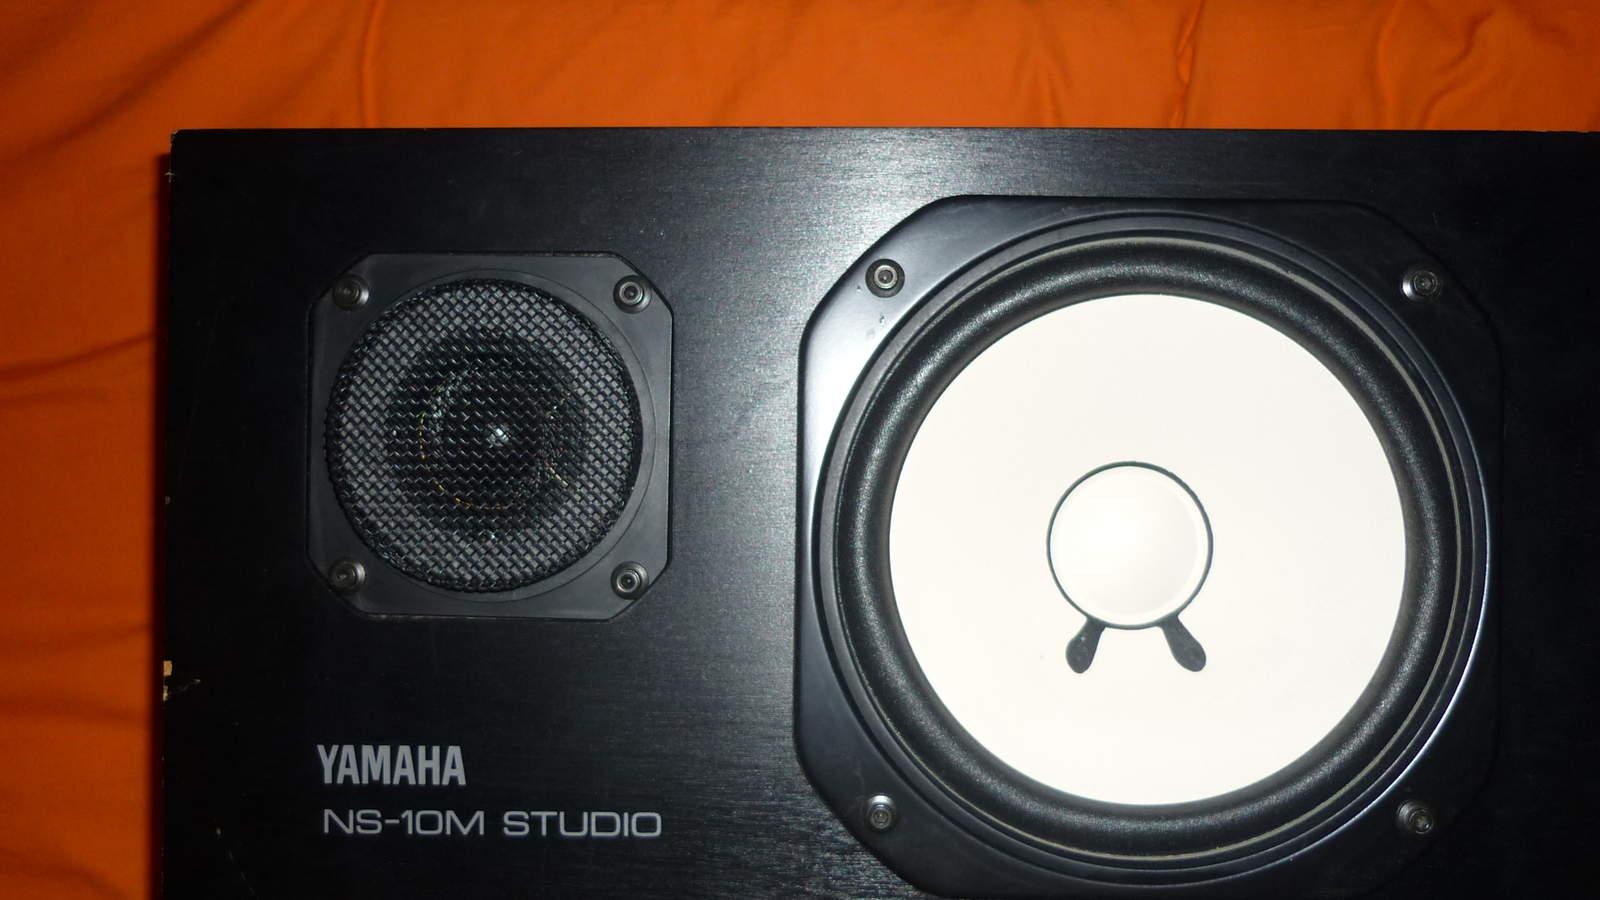 yamaha ns 10m studio image 182008 audiofanzine. Black Bedroom Furniture Sets. Home Design Ideas